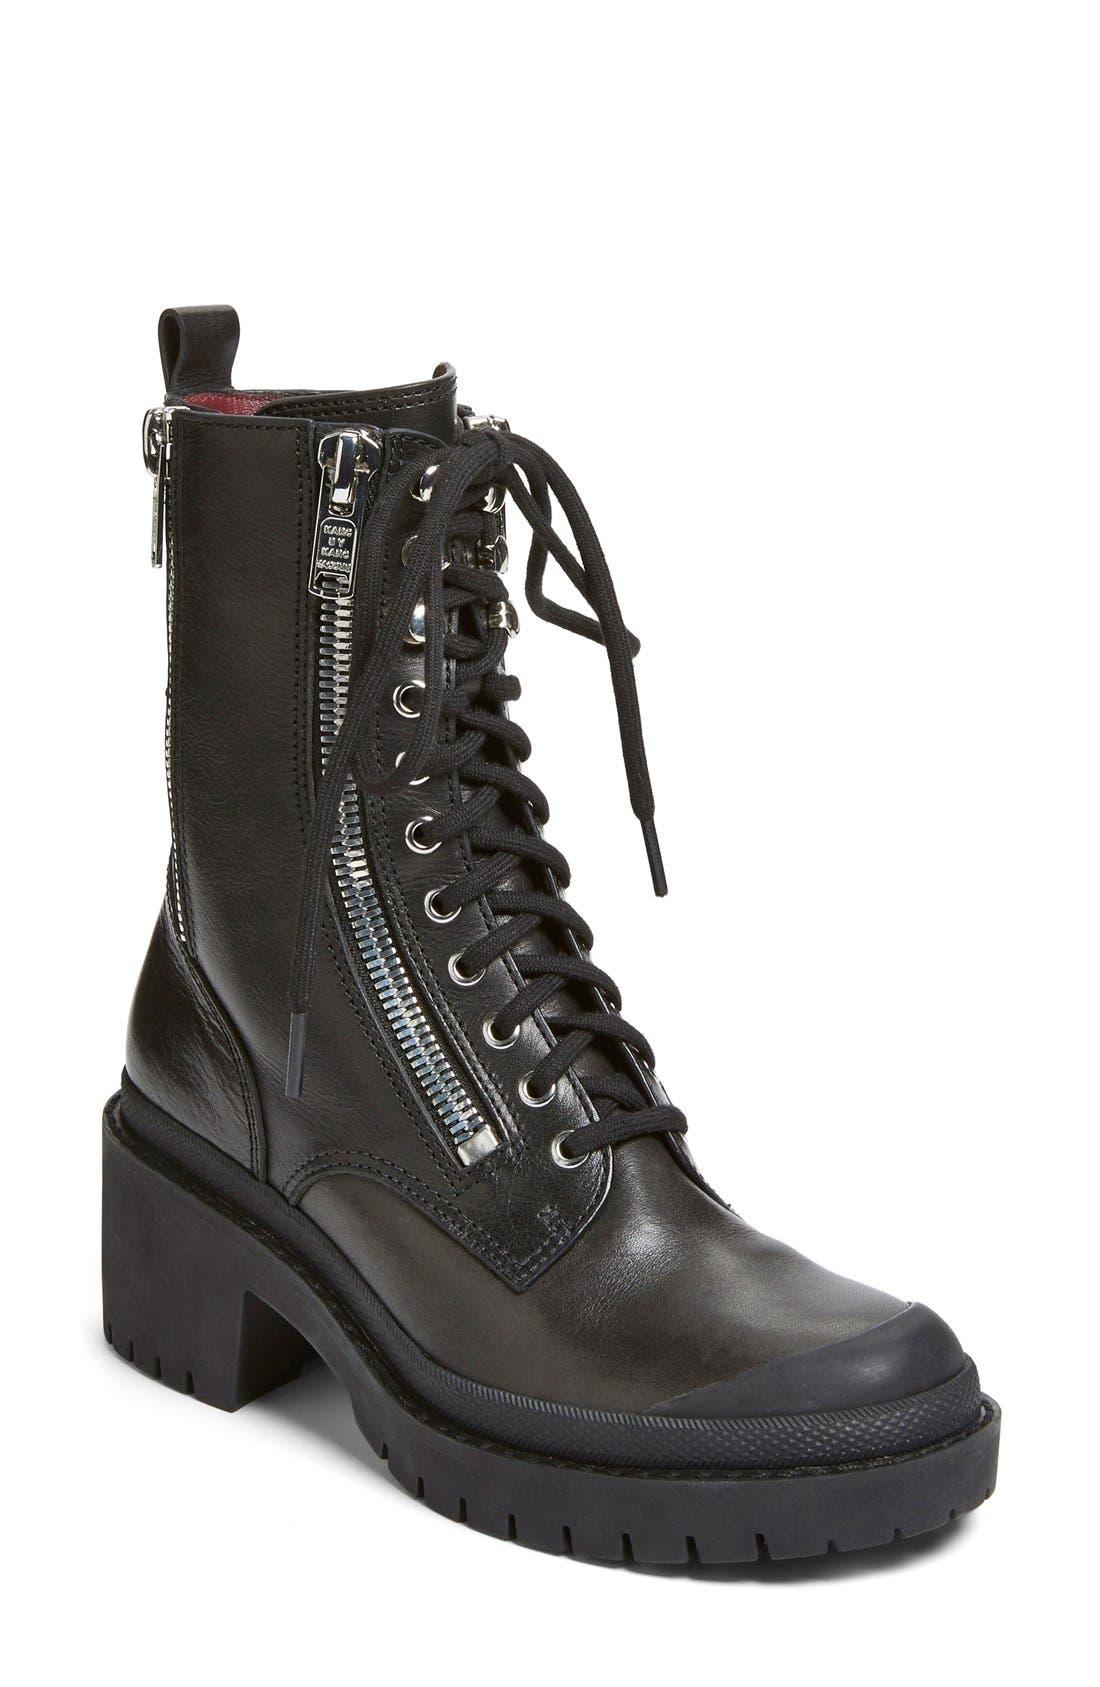 Alternate Image 1 Selected - MARC BY MARC JACOBS 'Zip It' Multi Zip Boot (Women)